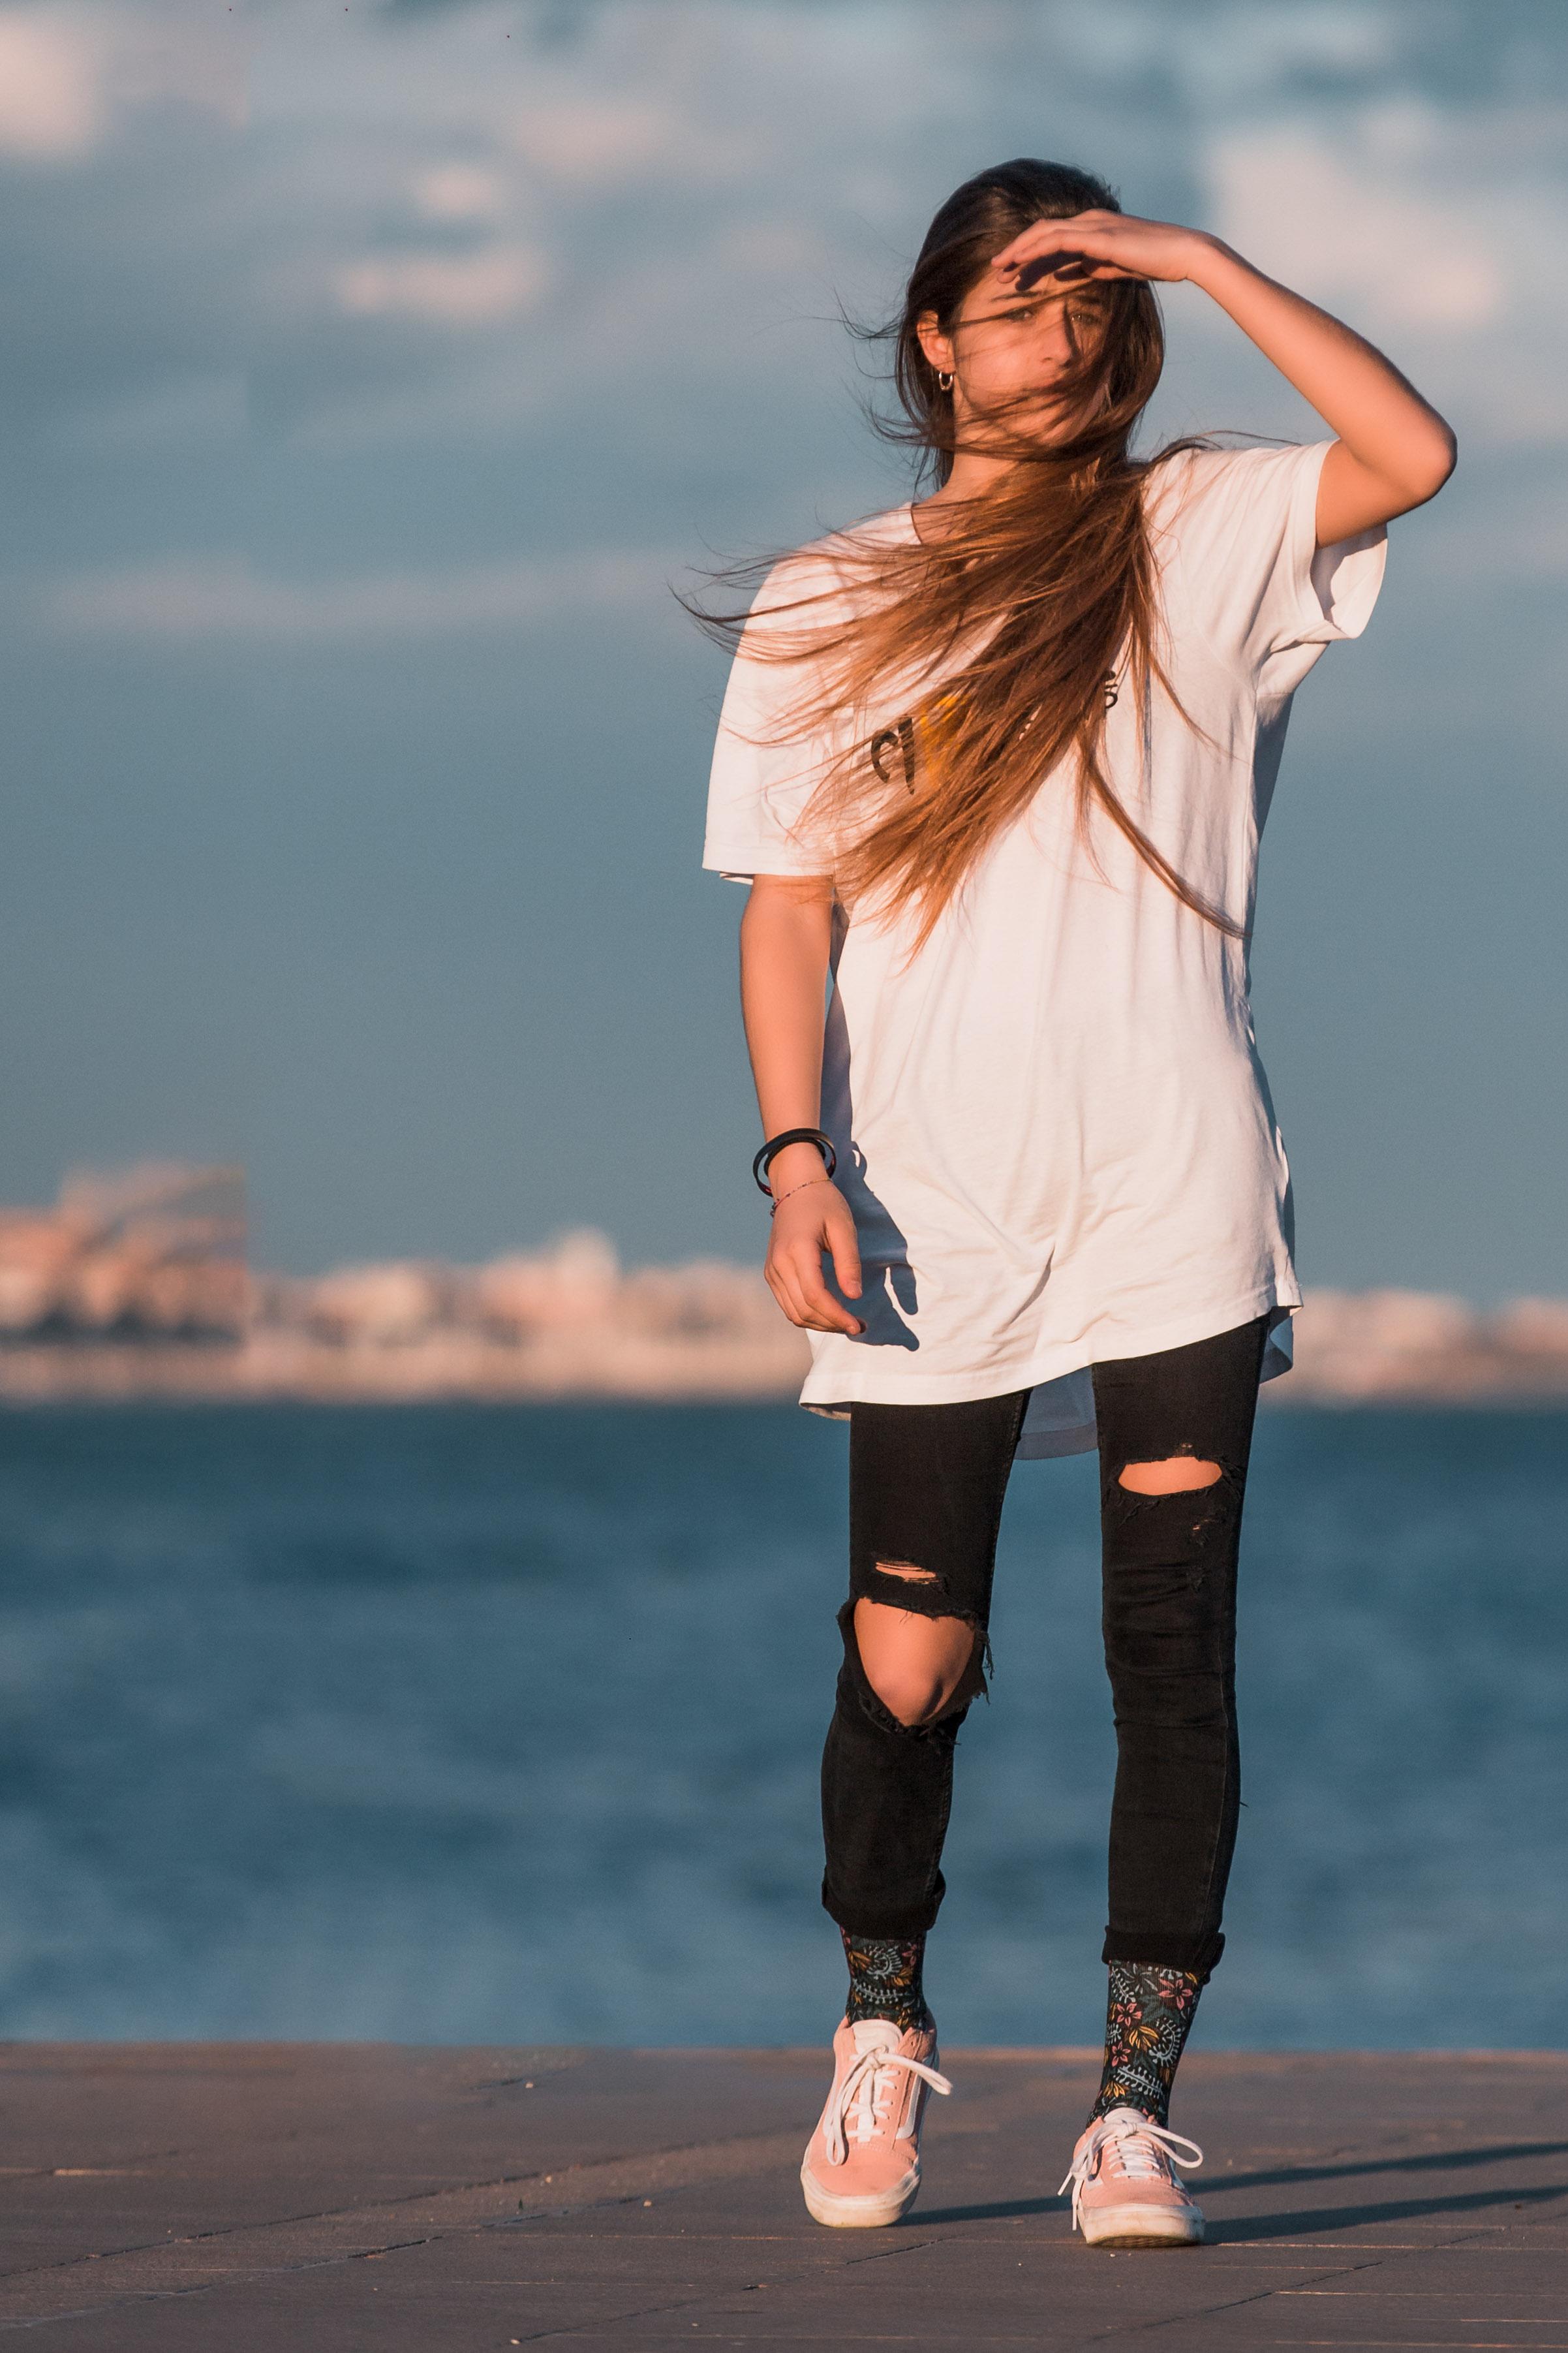 moda surfera raz surfcamp streetwear surfing clothing praia de razo american socks